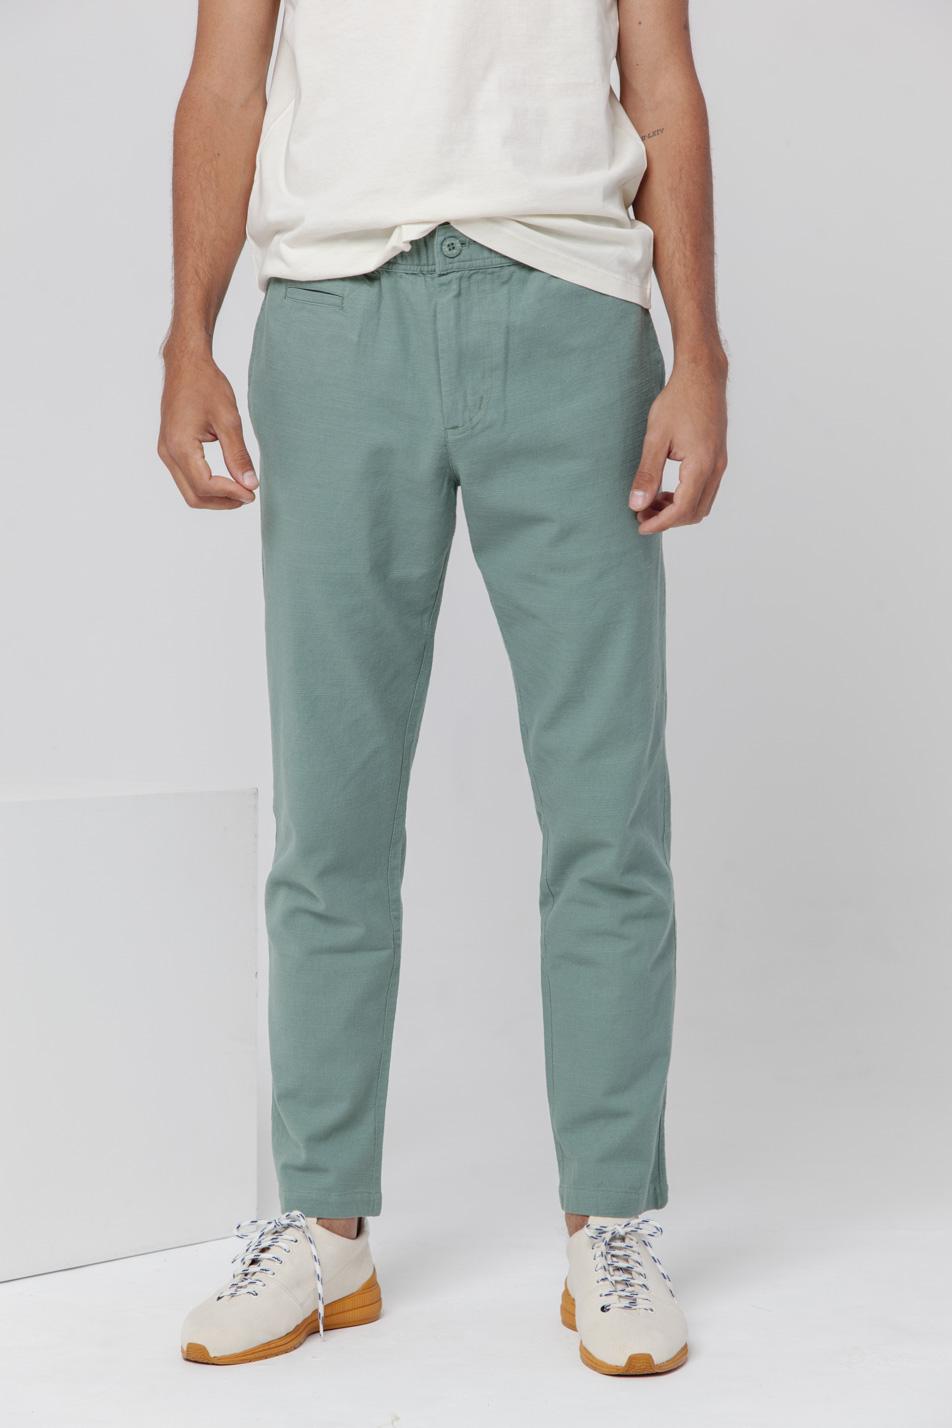 cheap prices super popular best sneakers Pantalon coton bio THINKING MU Travel vert